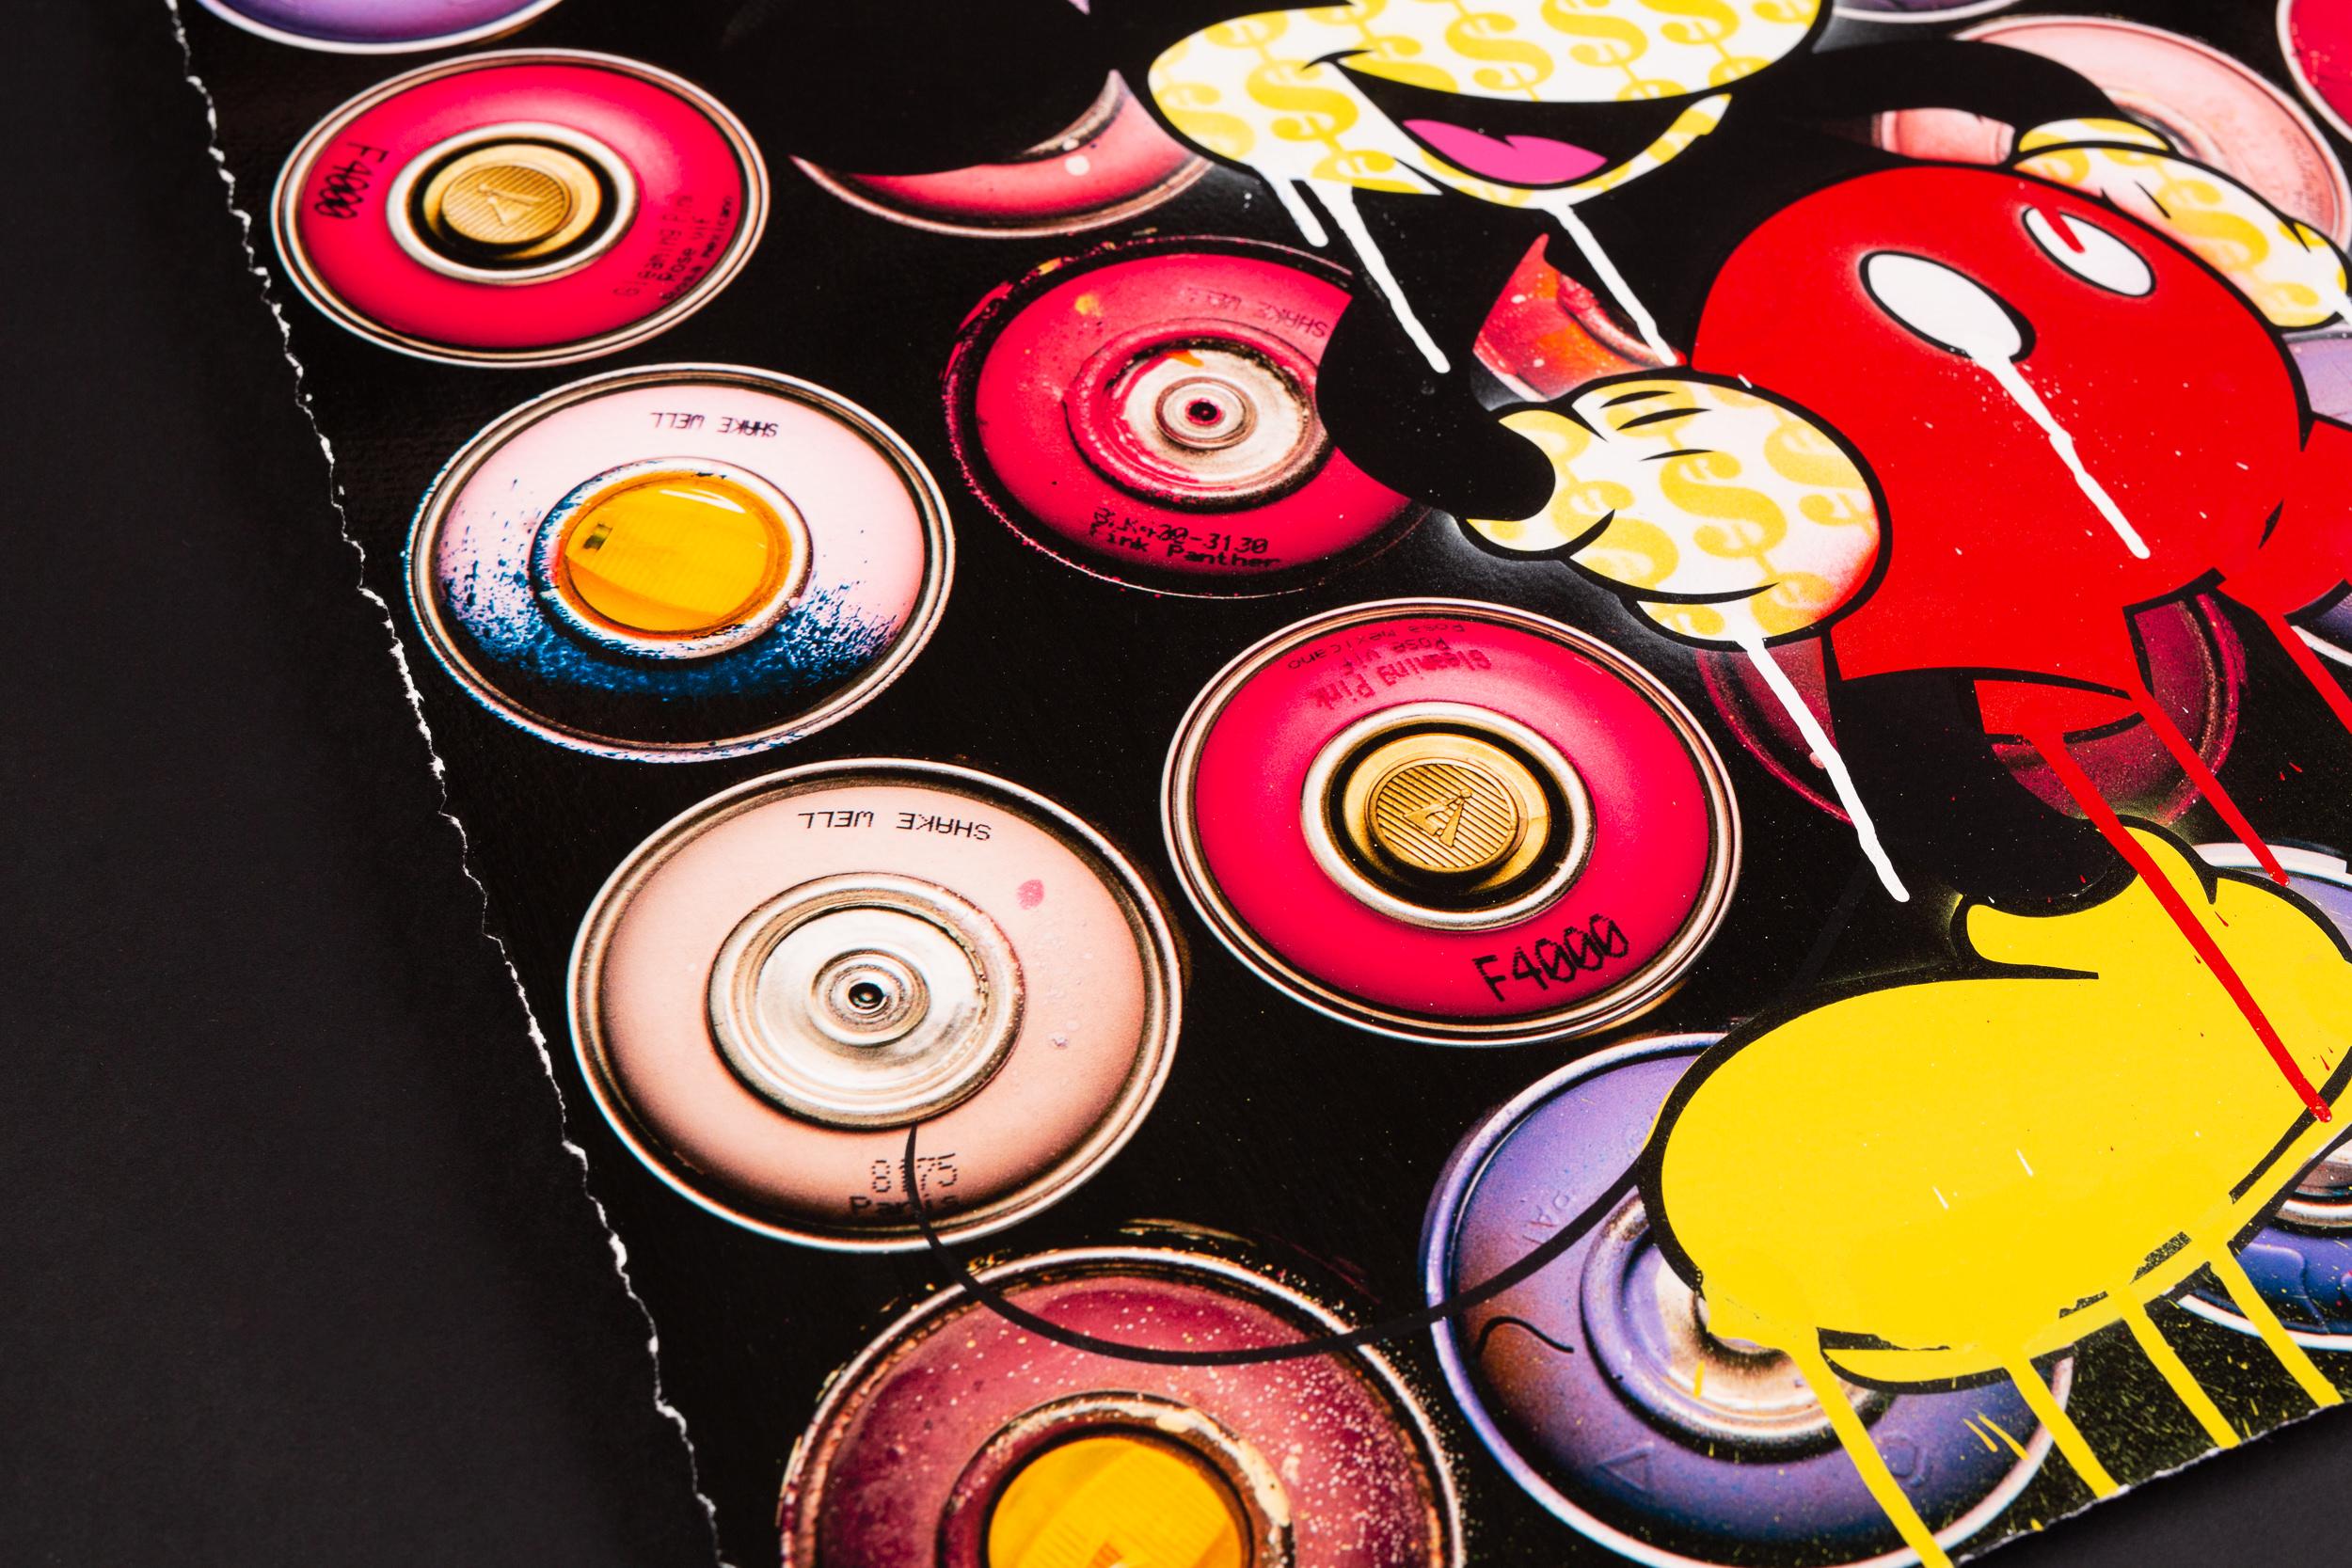 Popaganda-Cans-Mickey-Detail-03.jpg